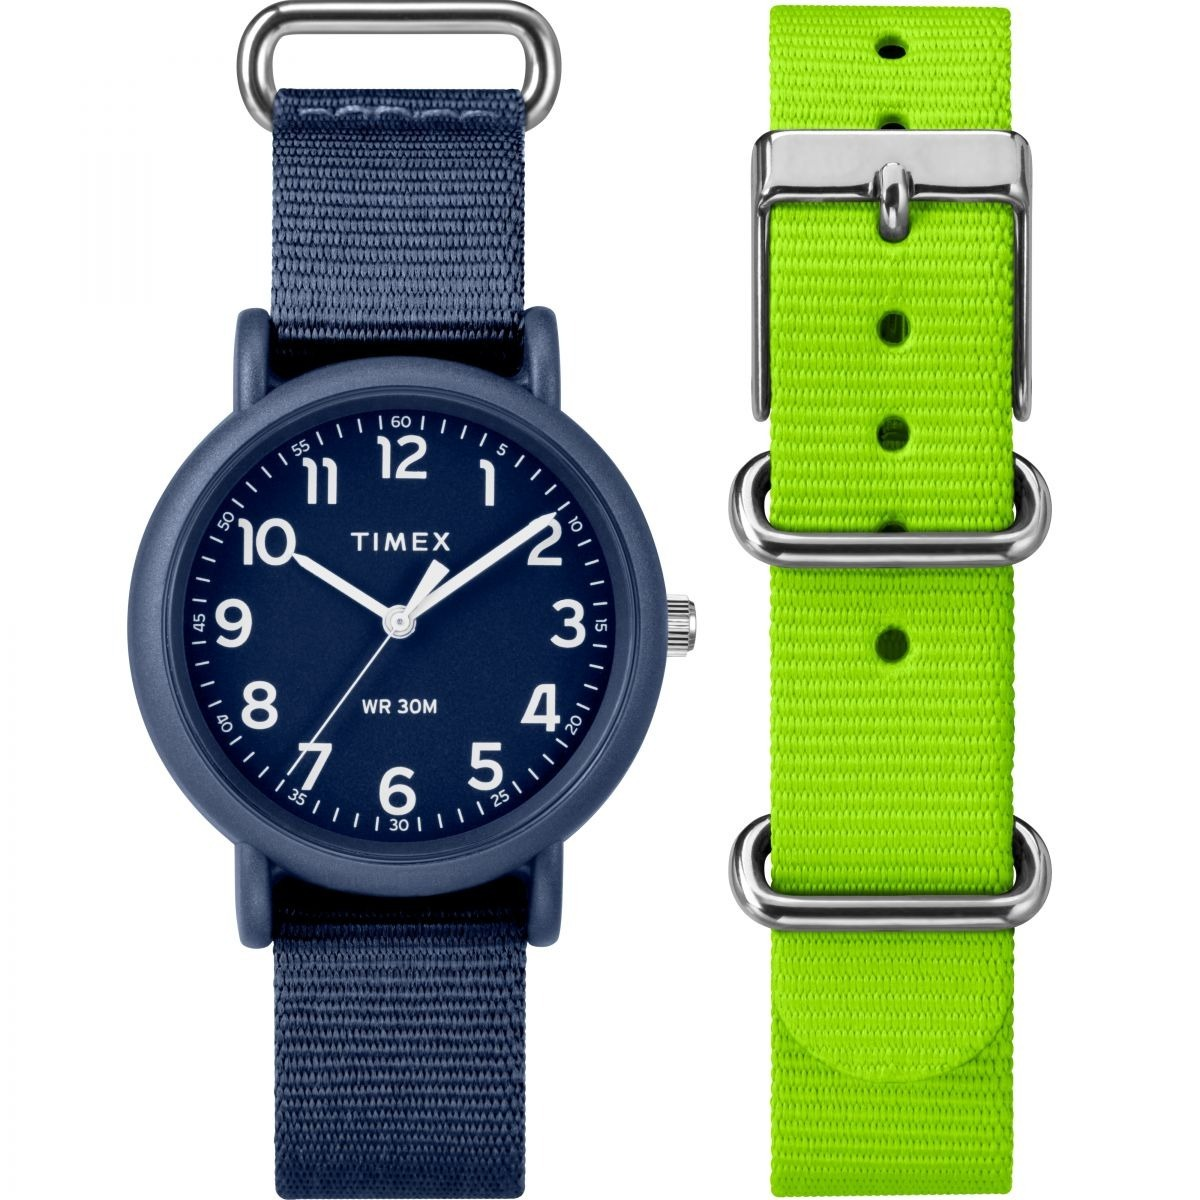 66bd97bc51d5 Reloj Timex Para Unisex Modelo  Twg018400 Envio Gratis -   699.00 en ...